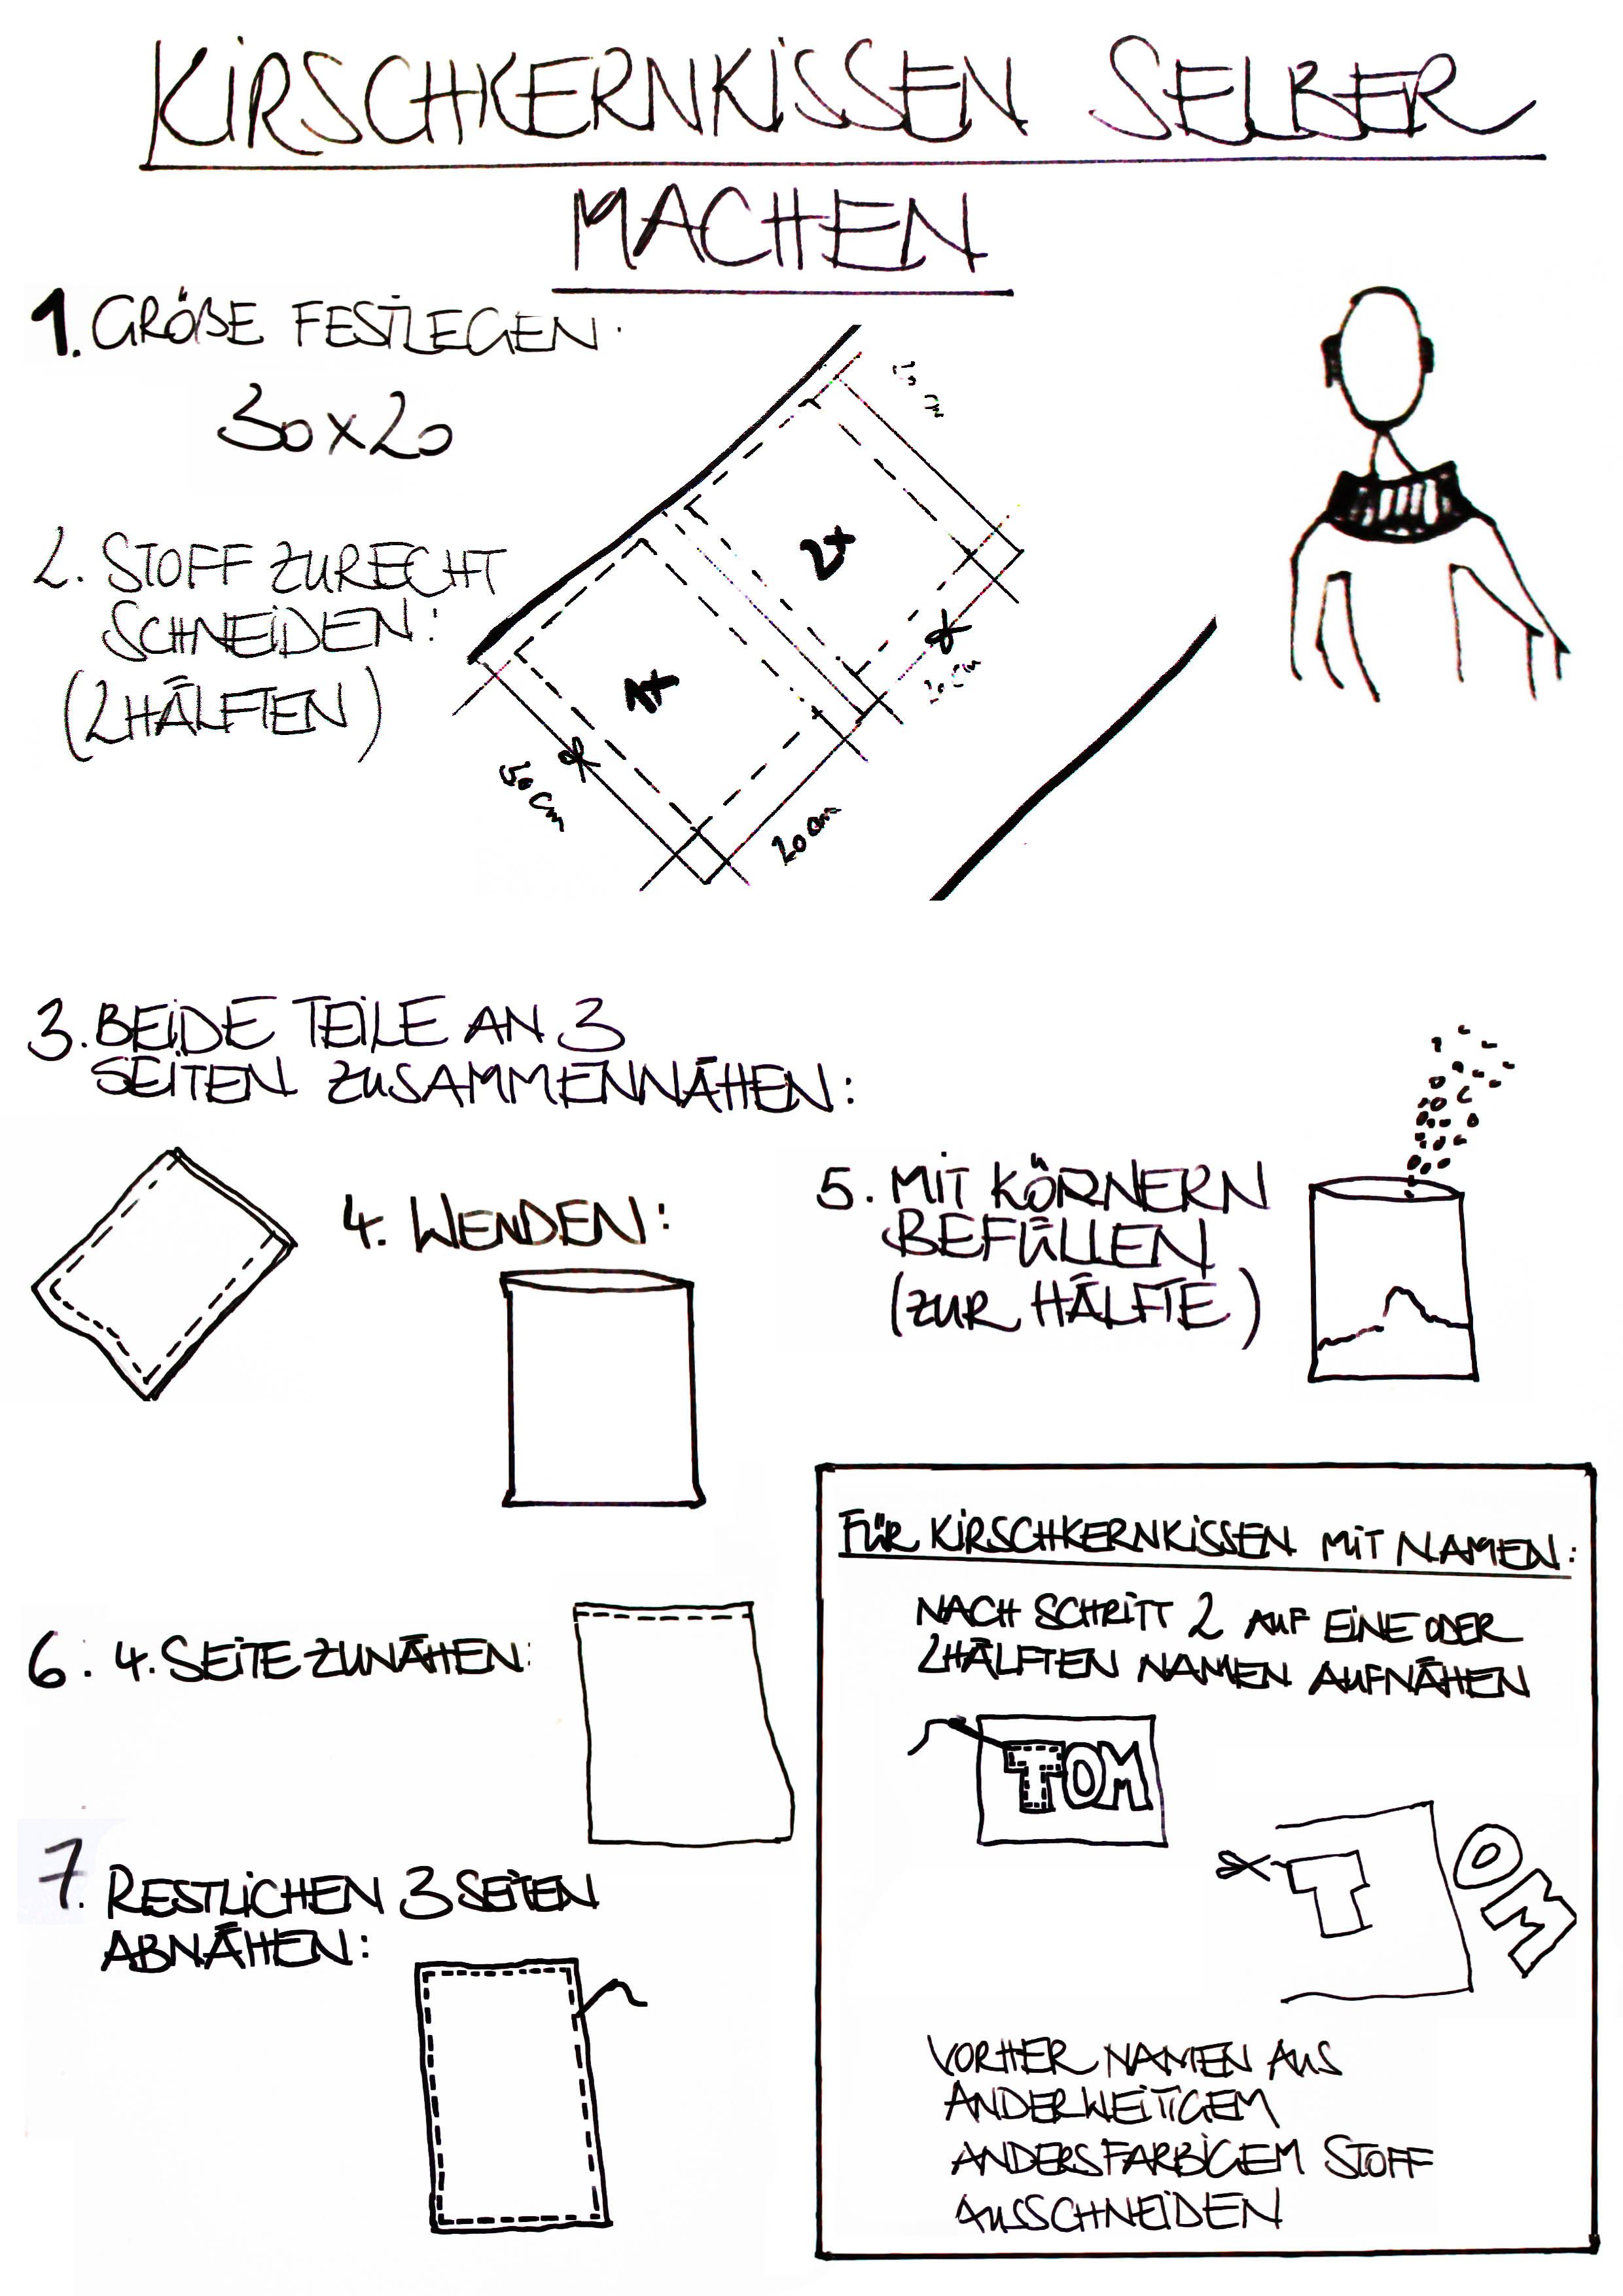 kirschkernkissen selber machen diy pinterest kirschkernkissen selber machen. Black Bedroom Furniture Sets. Home Design Ideas